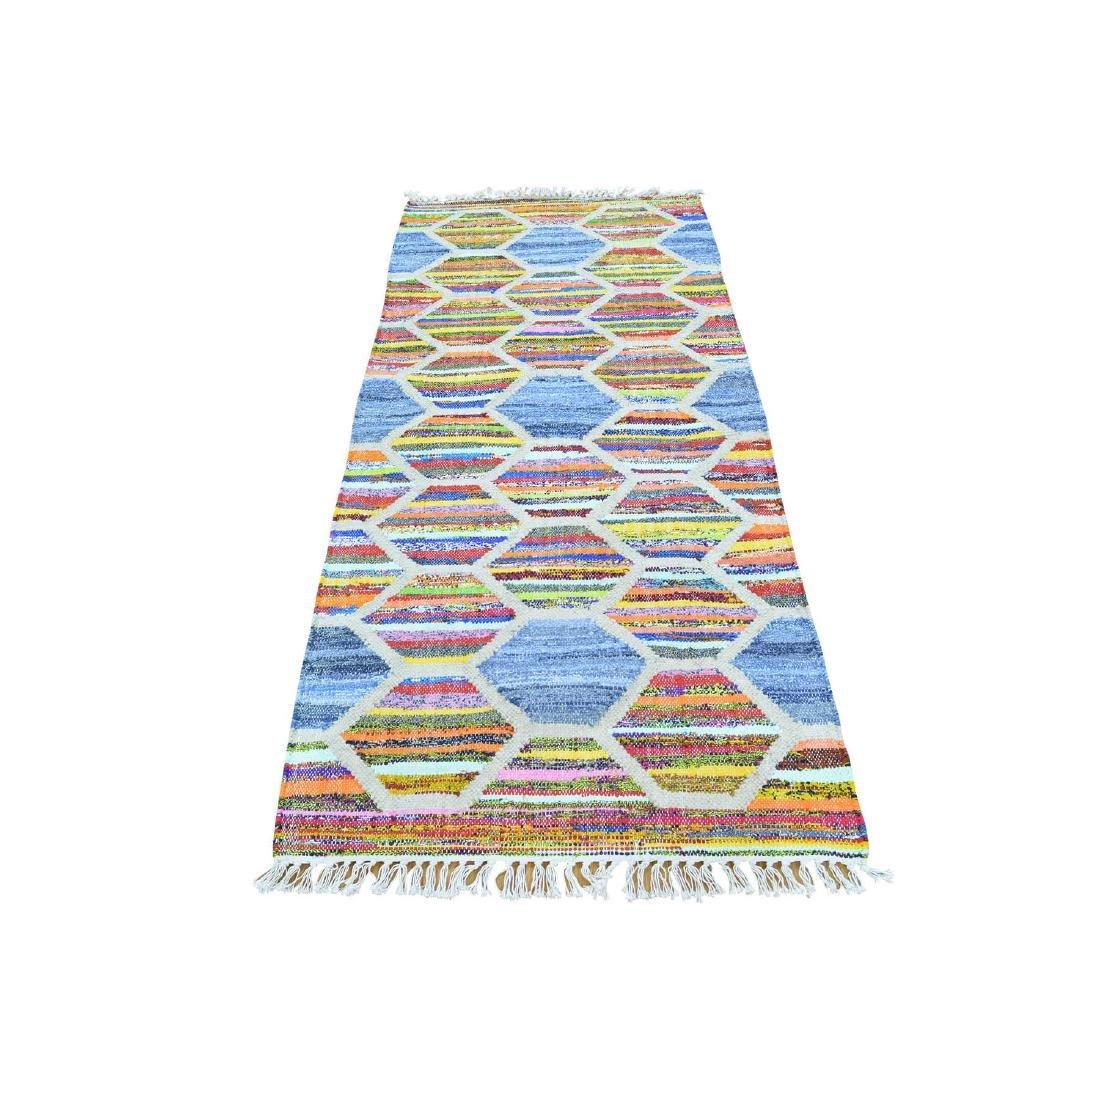 Hand Woven Kilim Runner Cotton & Sari Silk Rug 2.7x6